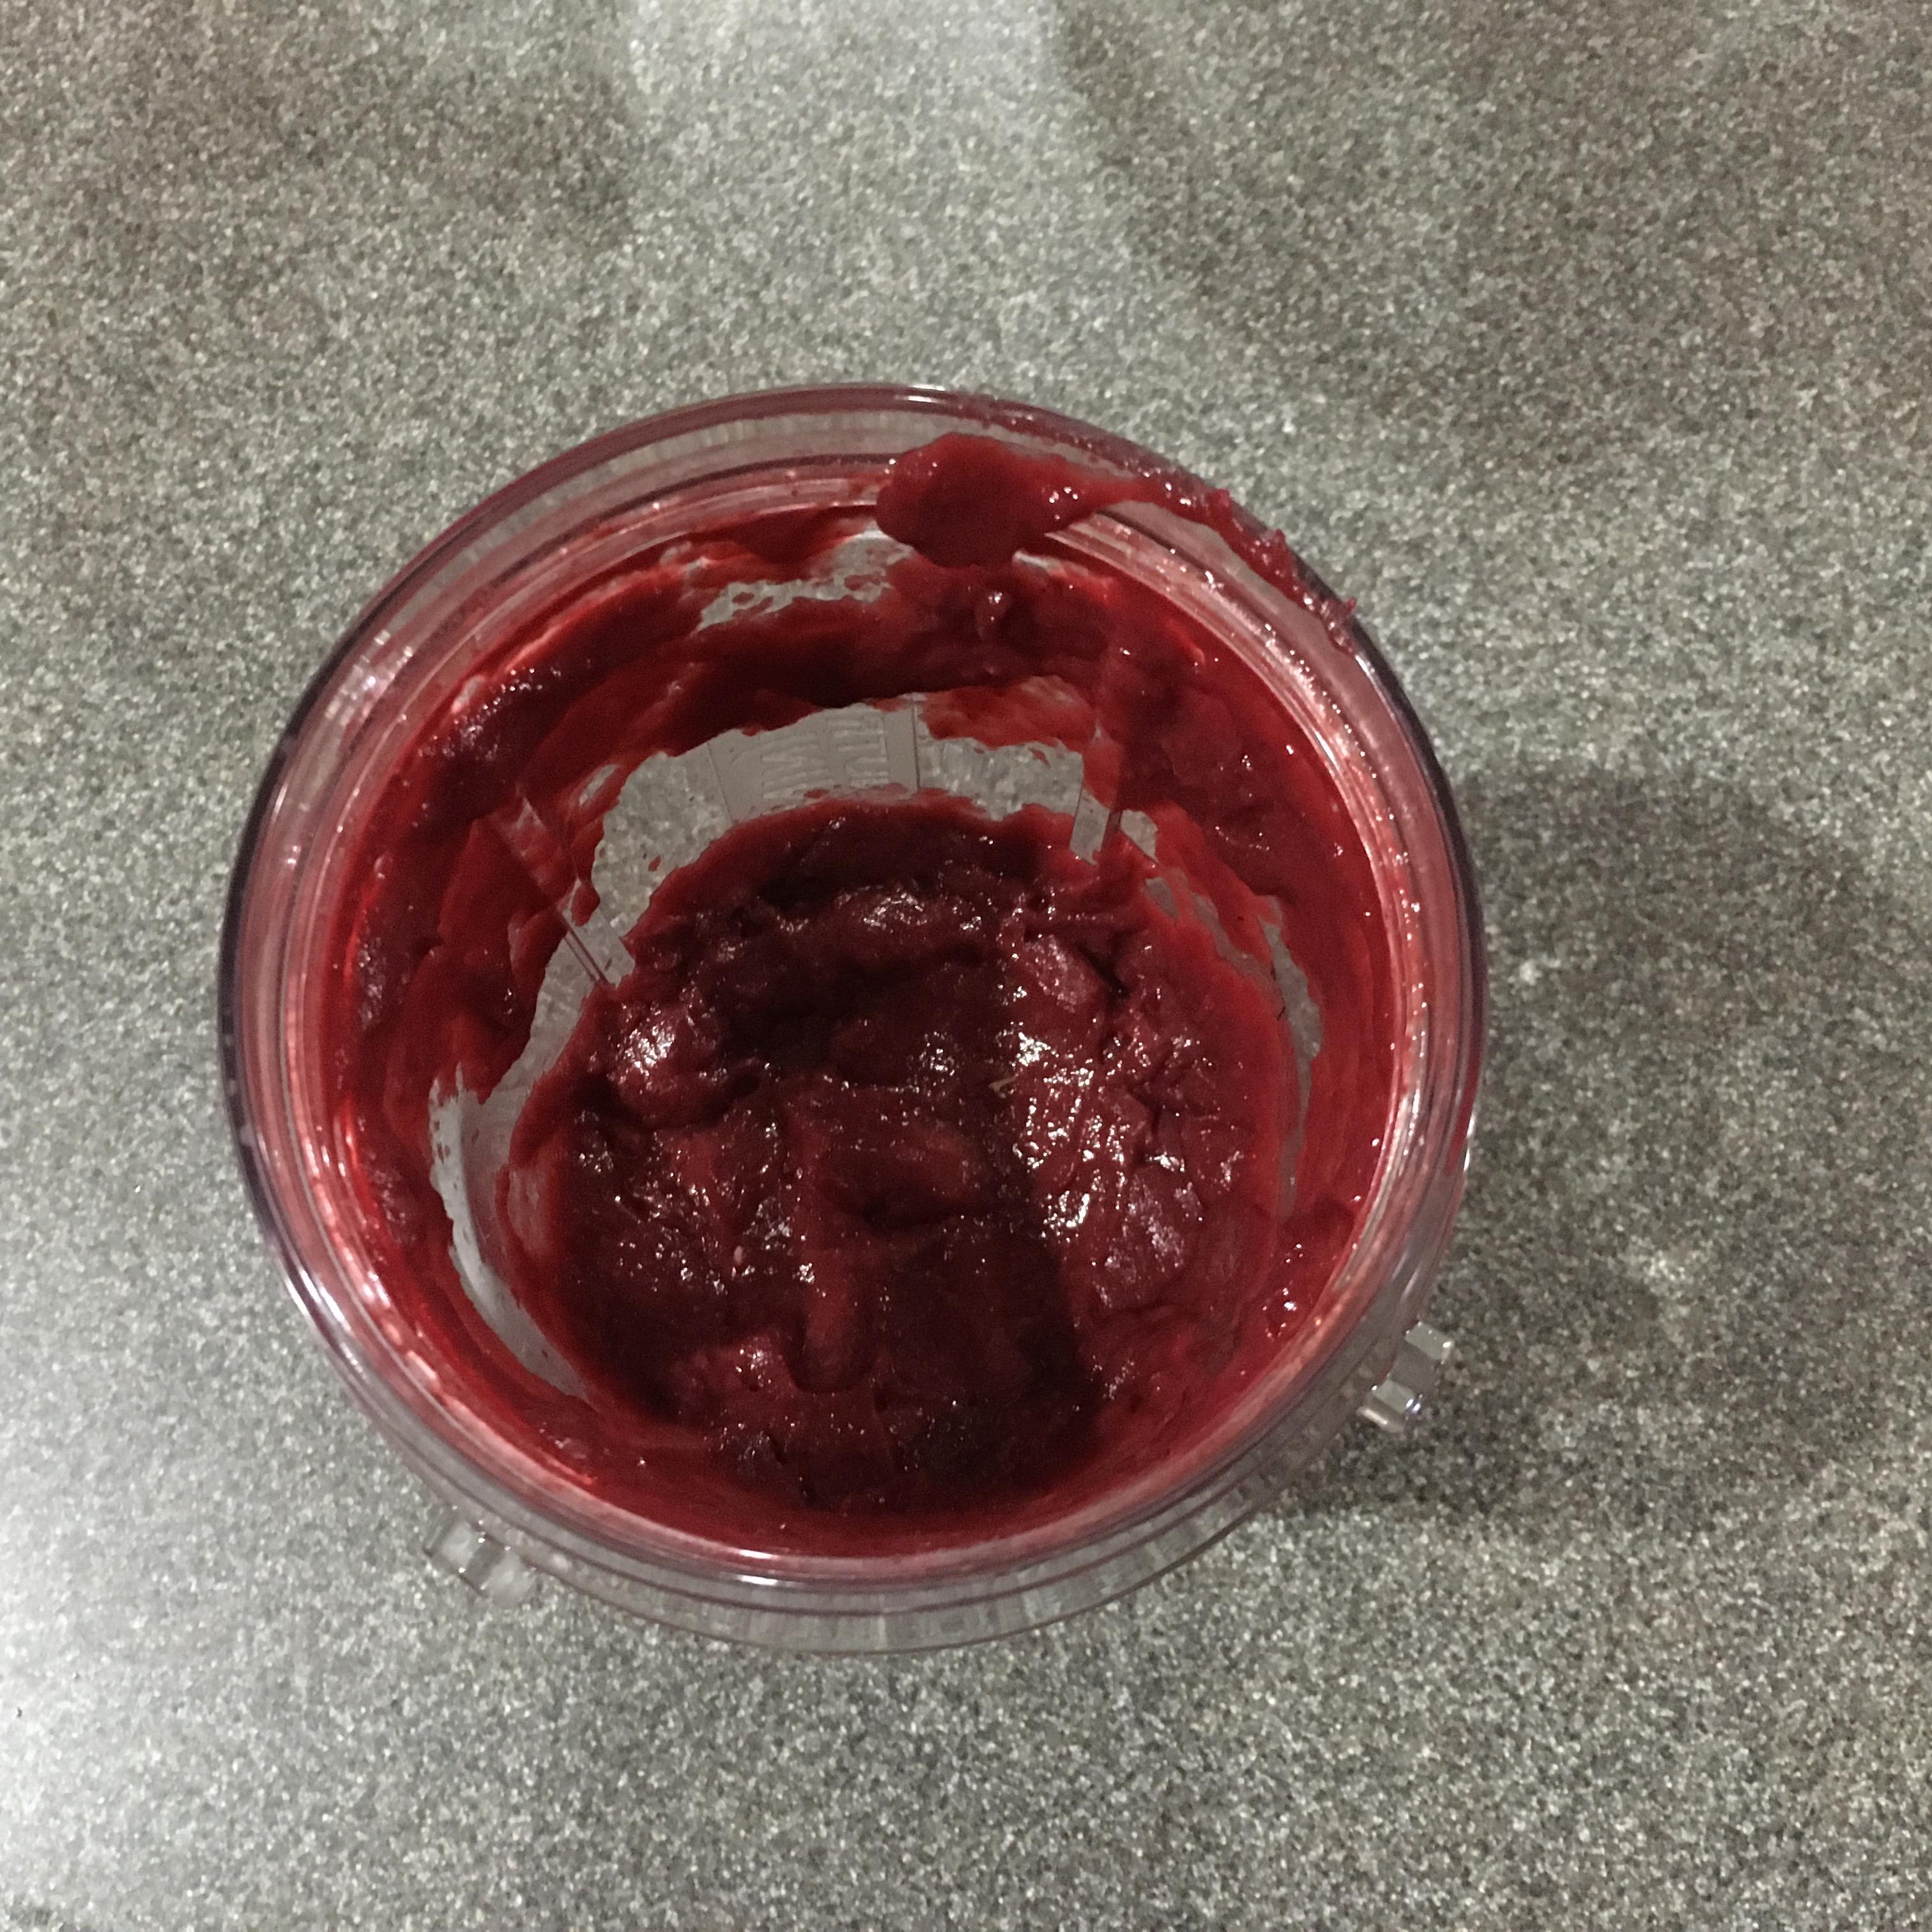 Low Carb Blackberry BBQ Sauce larryl22